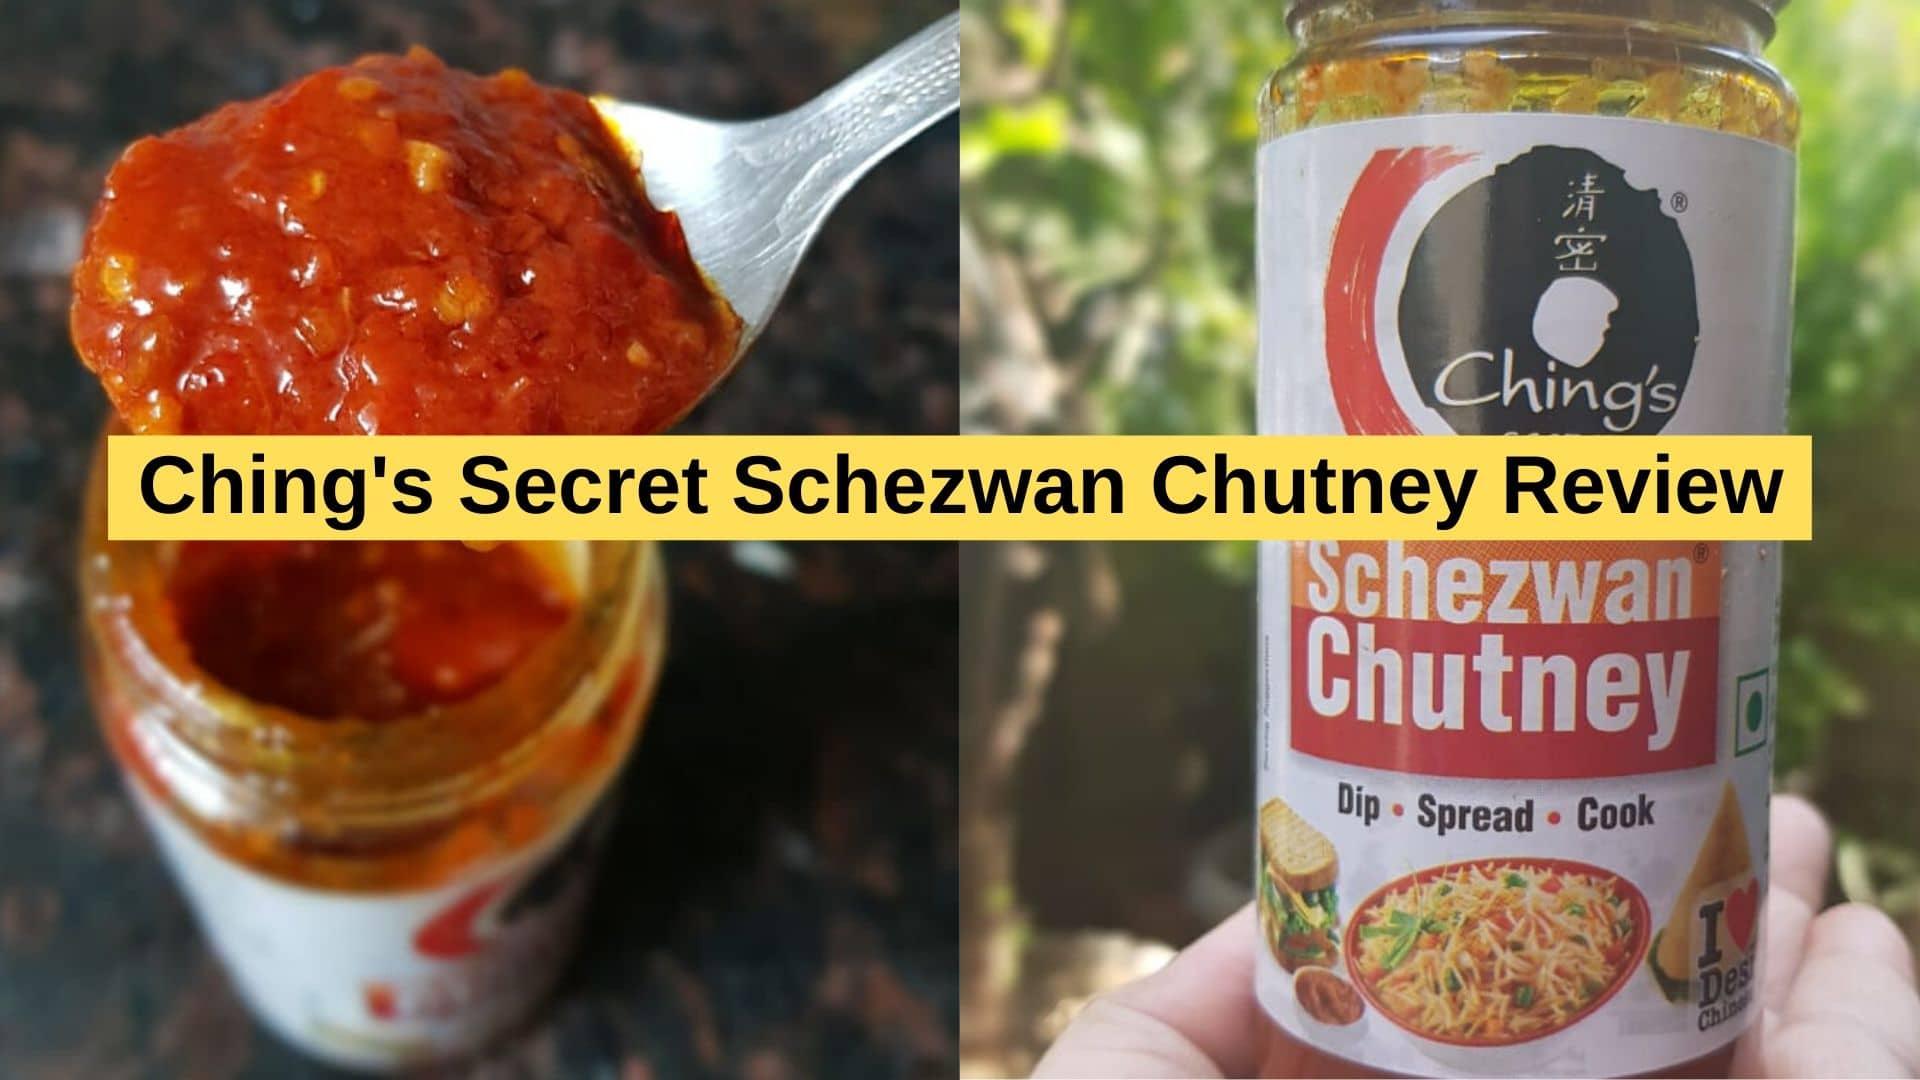 Ching's Secret Schezwan Chutney Review